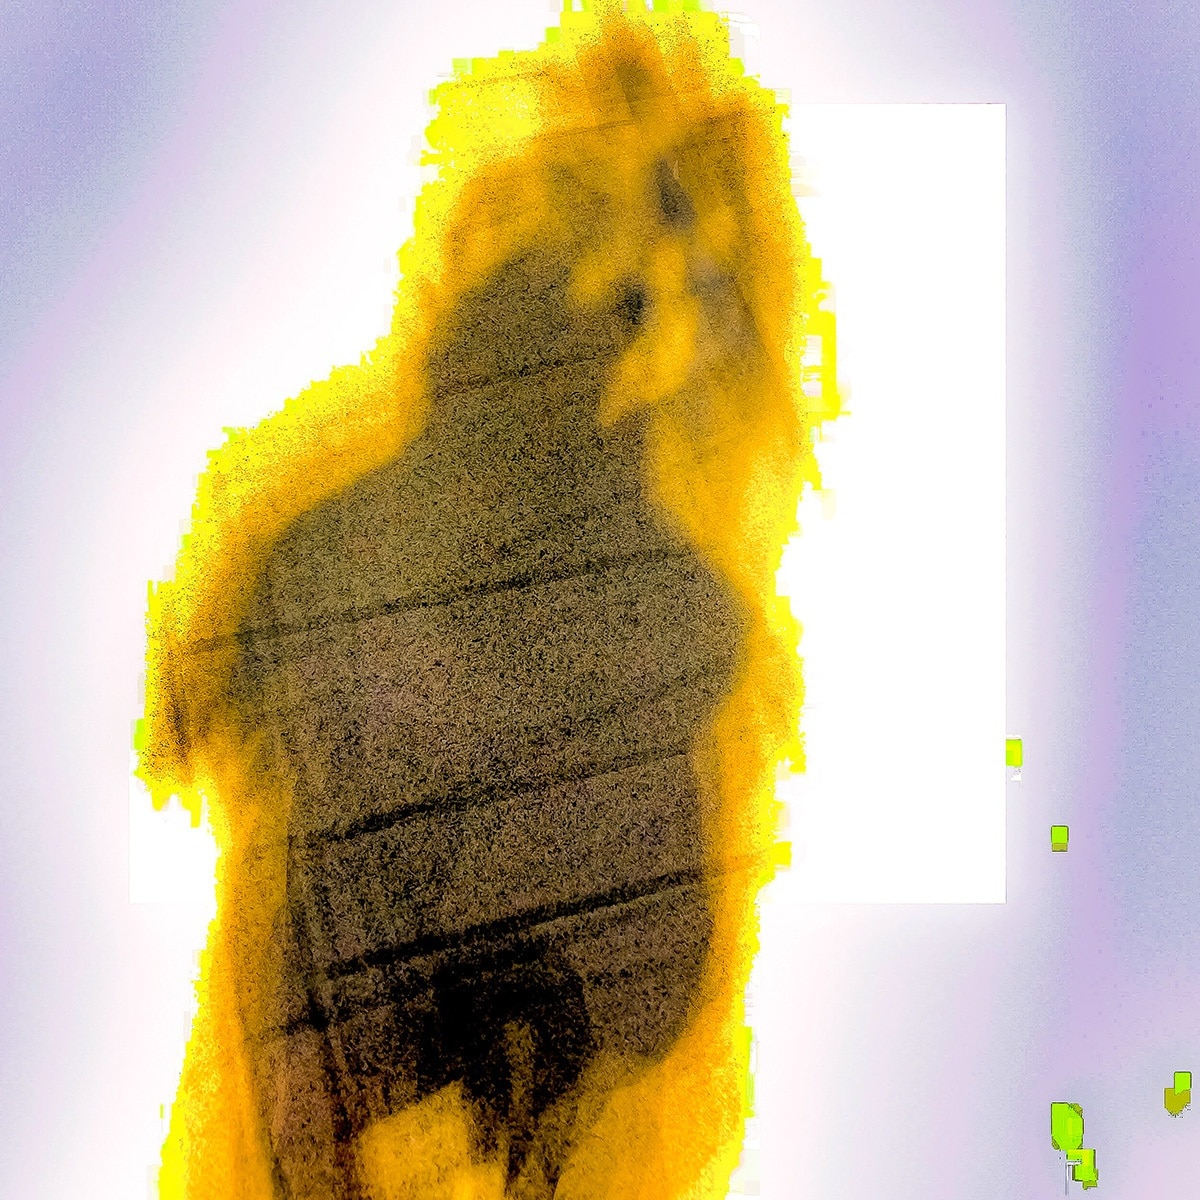 Shadow No. 01 // 18 x18, Fineart Print auf Photorag, 2018